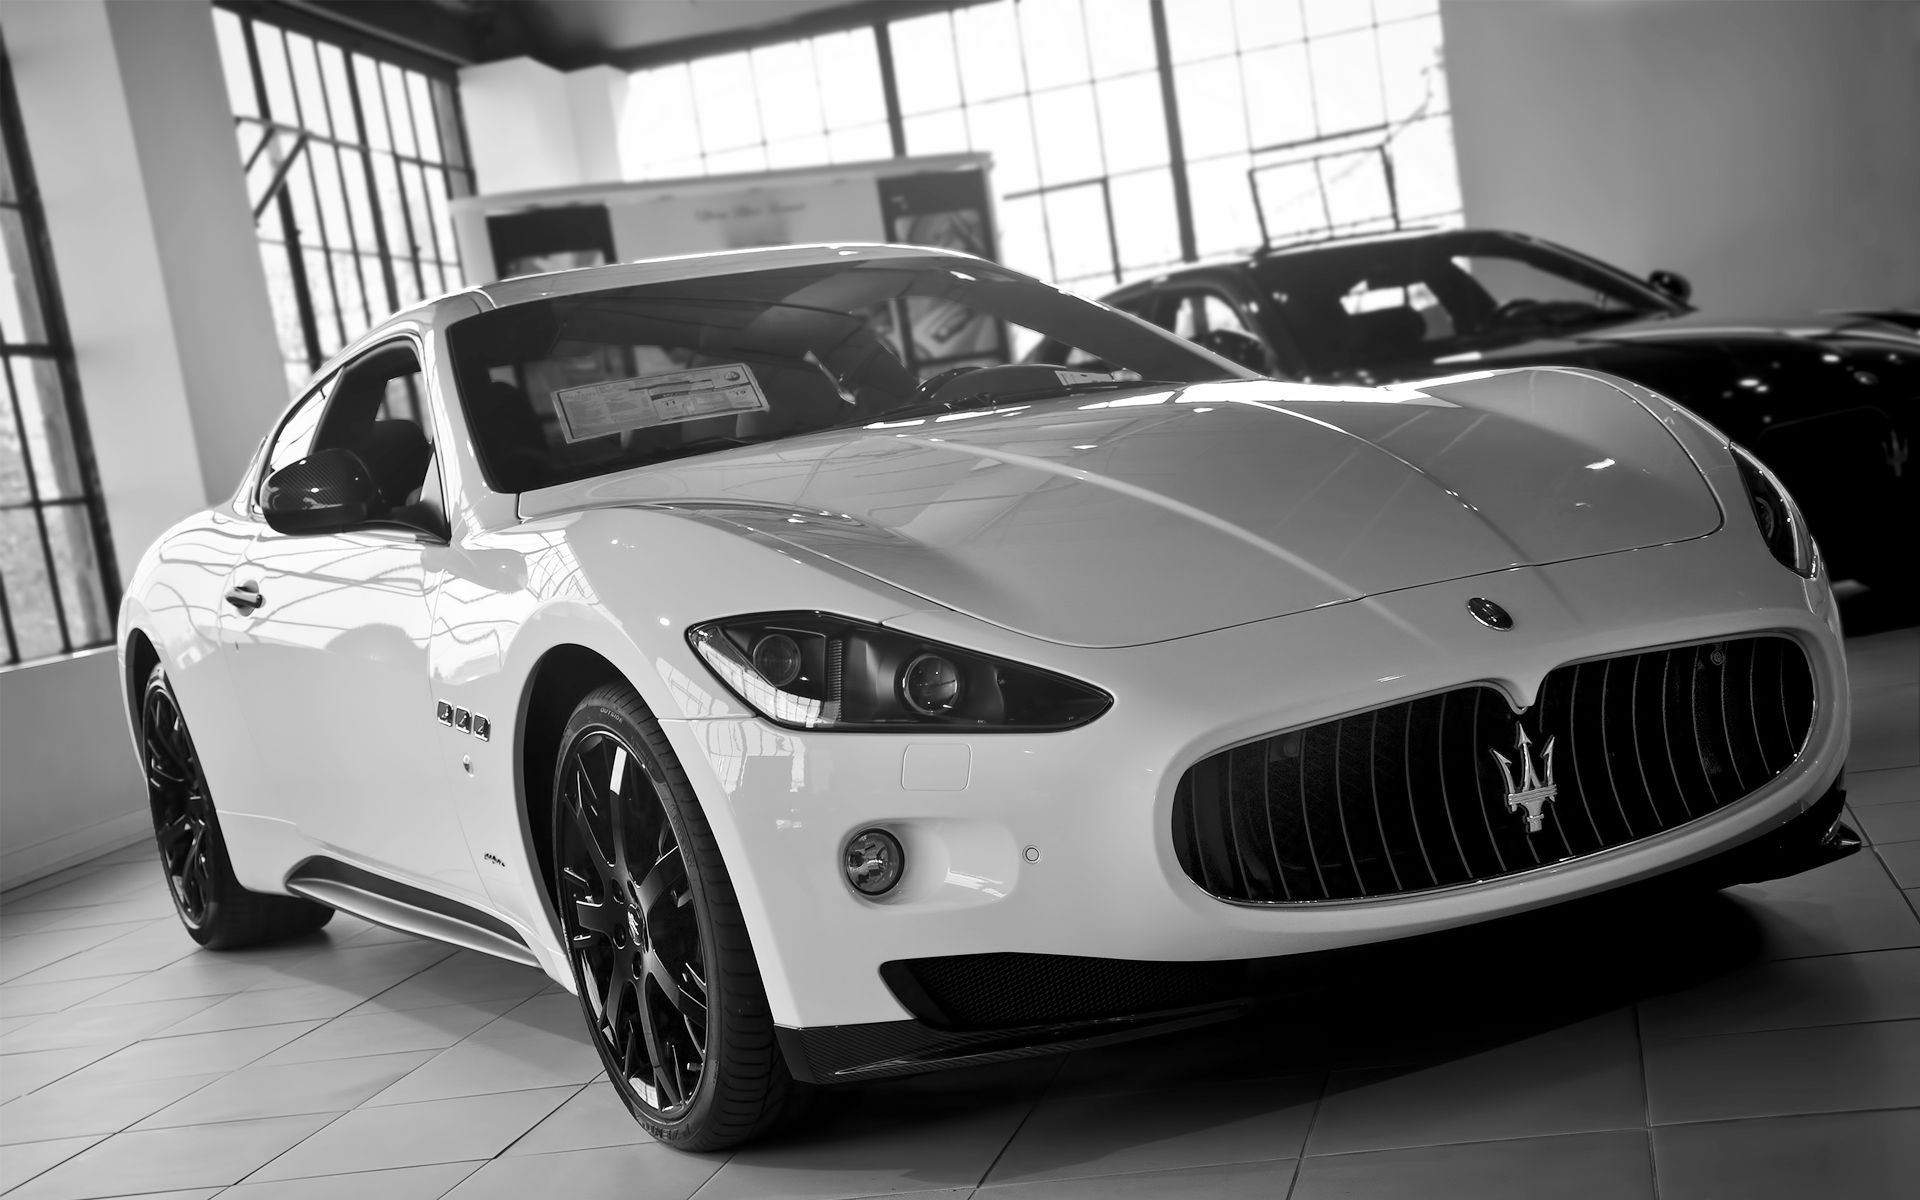 Cool Car Maserati Granturismo Maserati Car